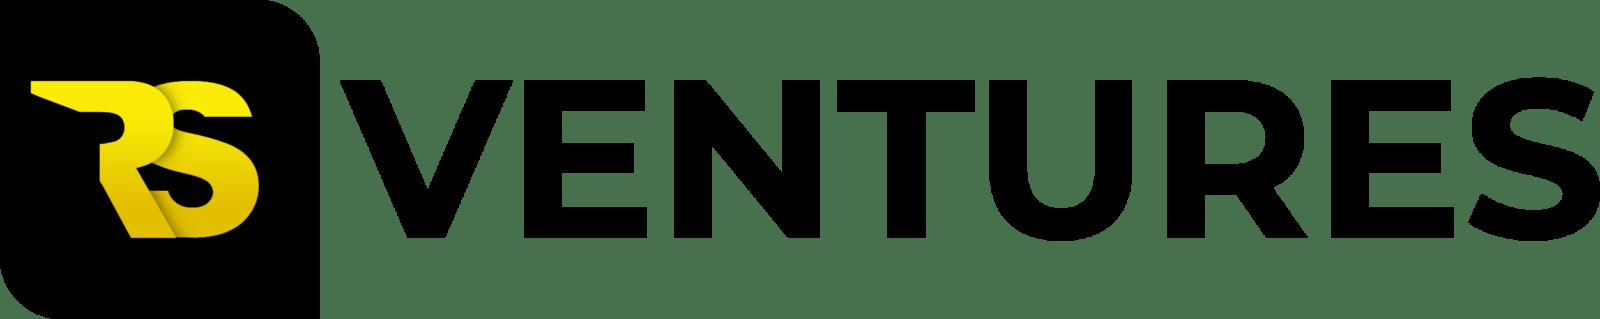 RS Ventures Logo